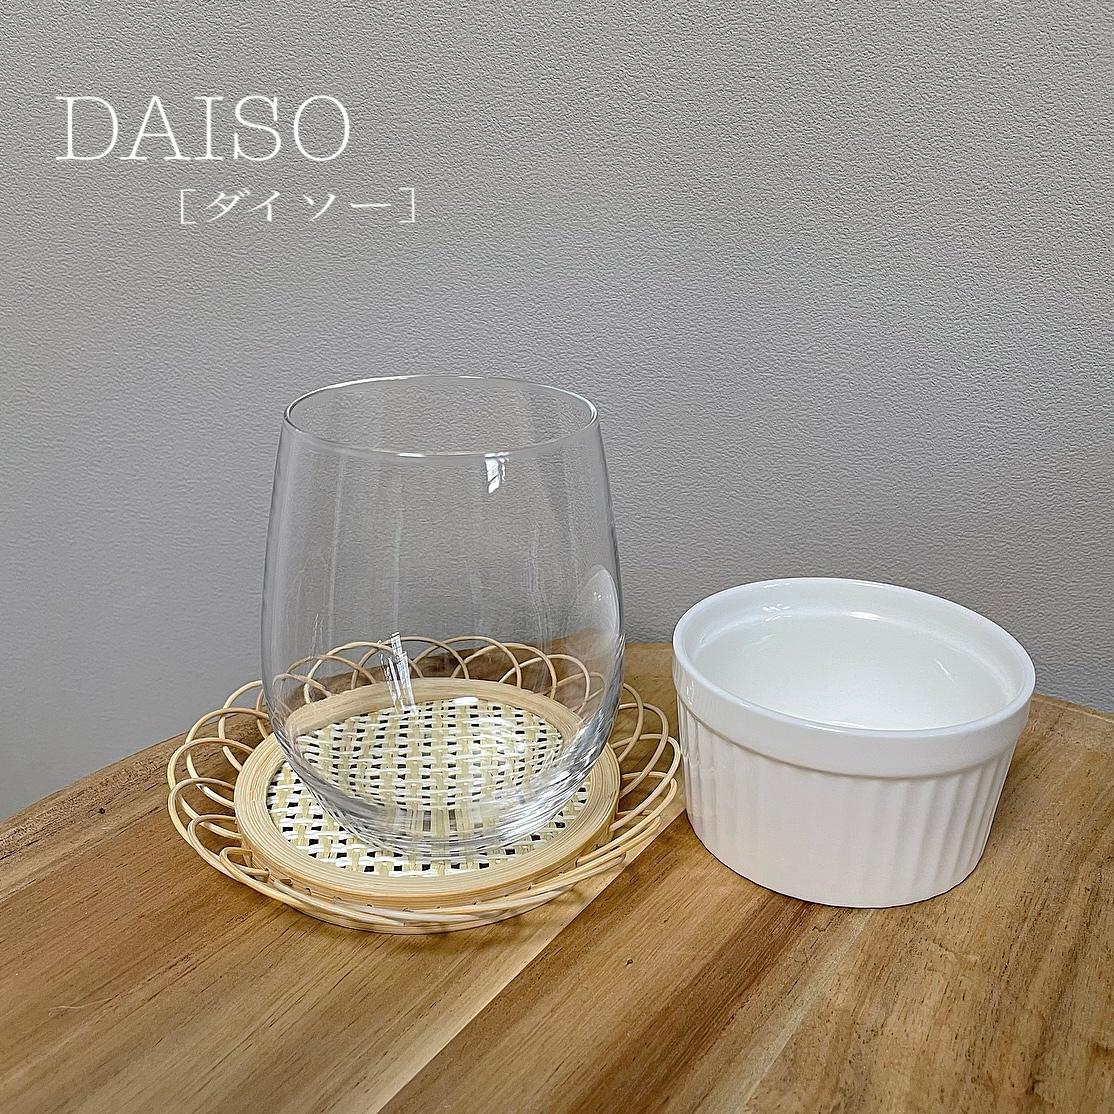 【home cafe】料理が映えるお皿_3